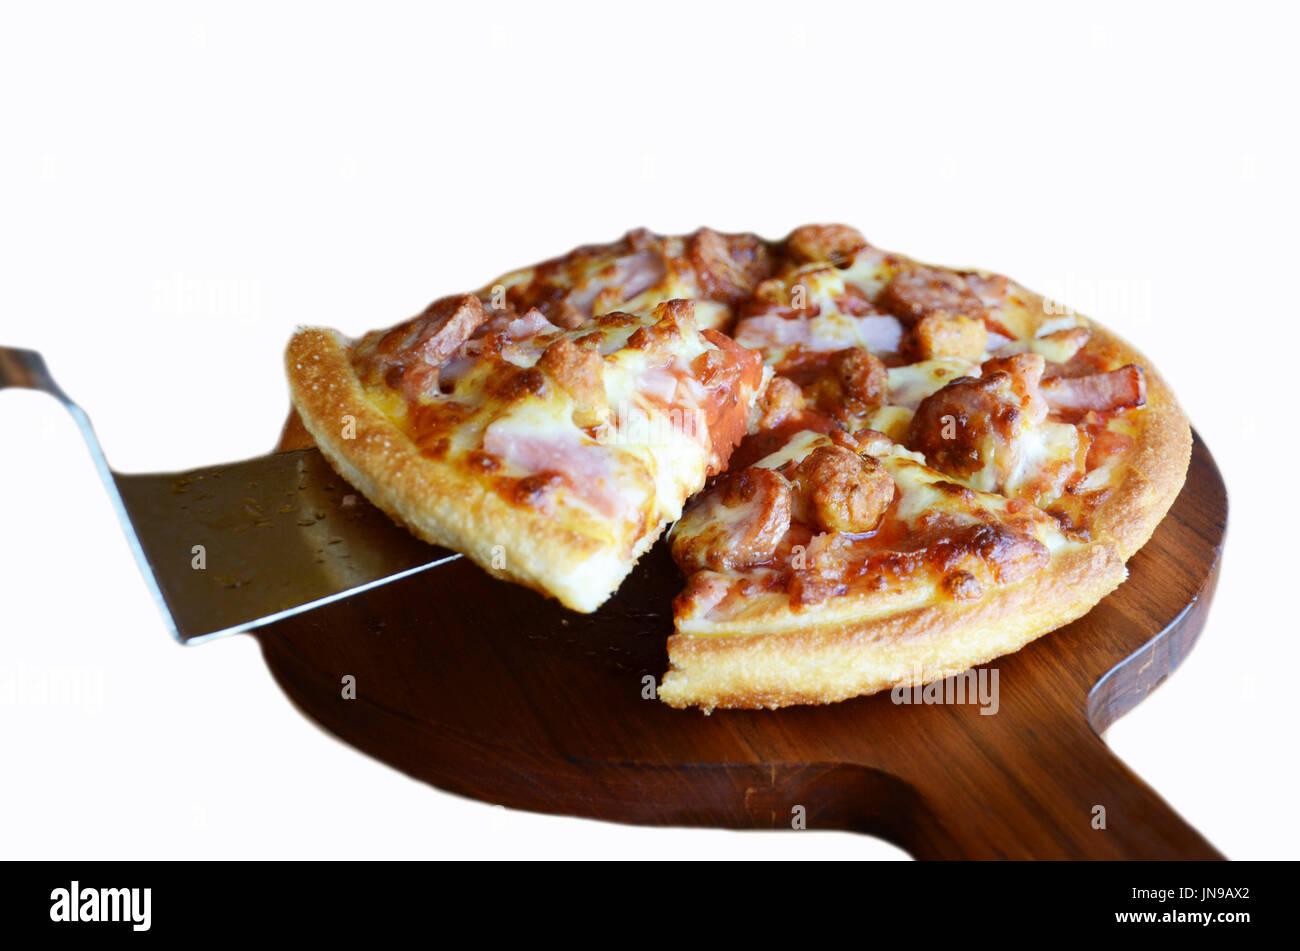 pizza on white background - Stock Image